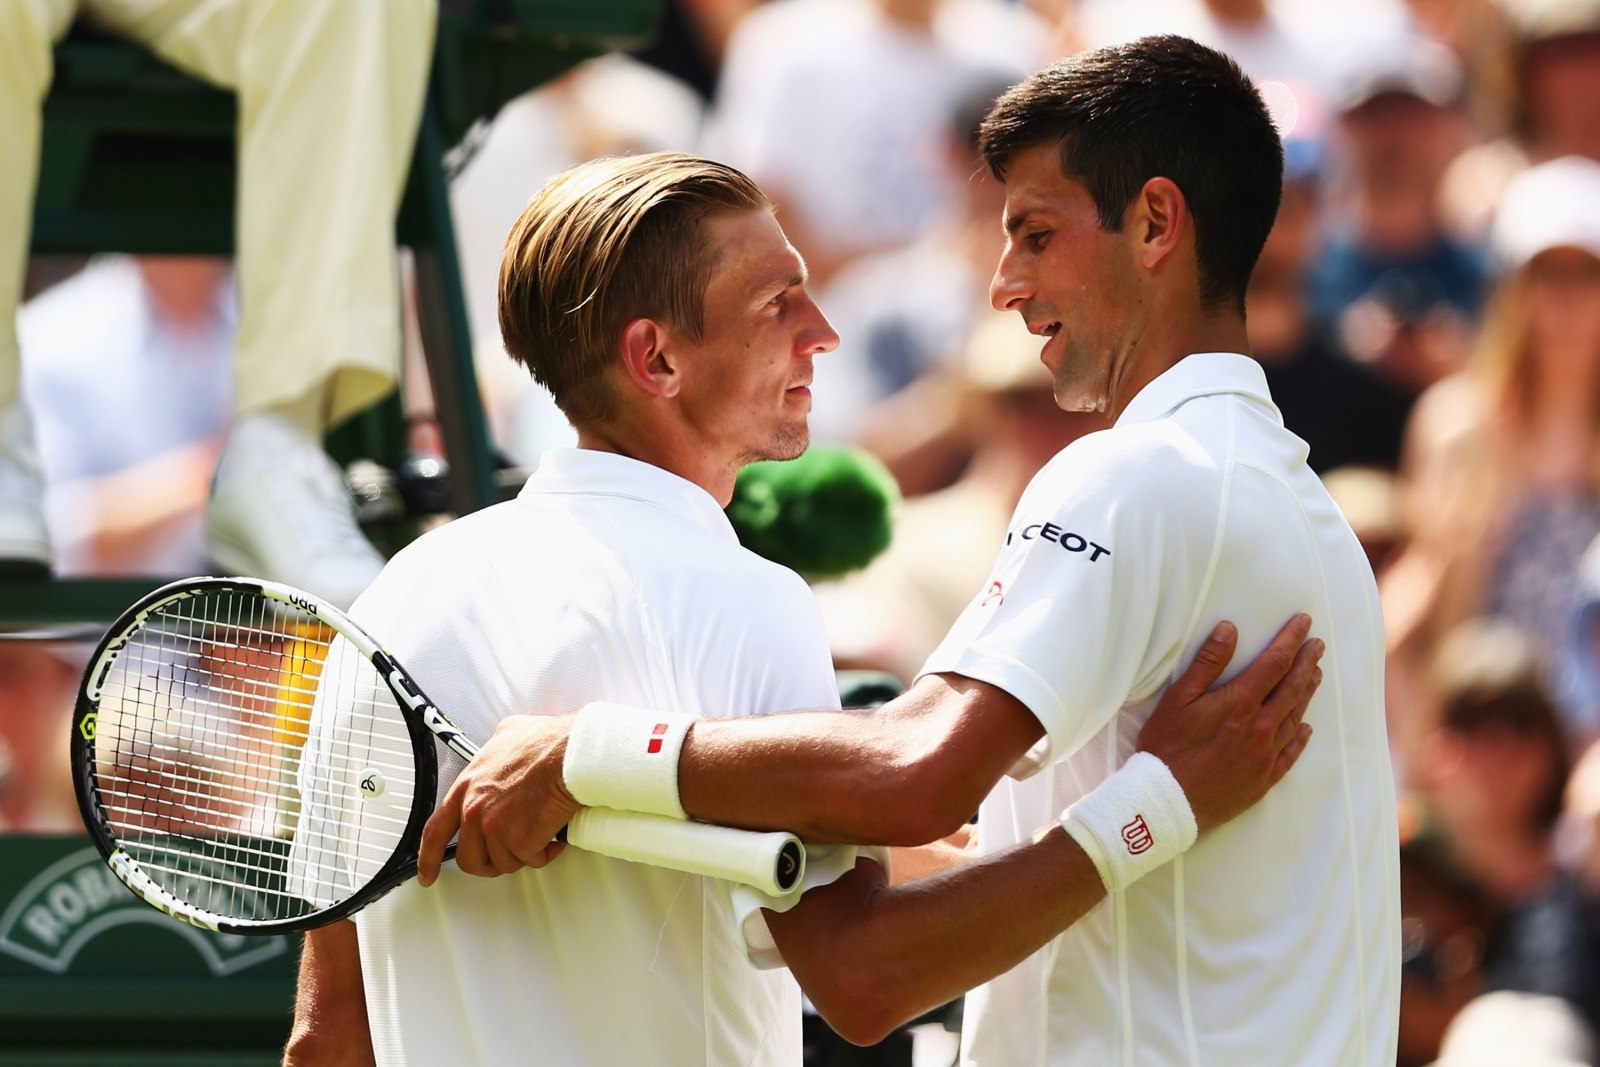 Novak Djokovic and Jarkko Nieminen